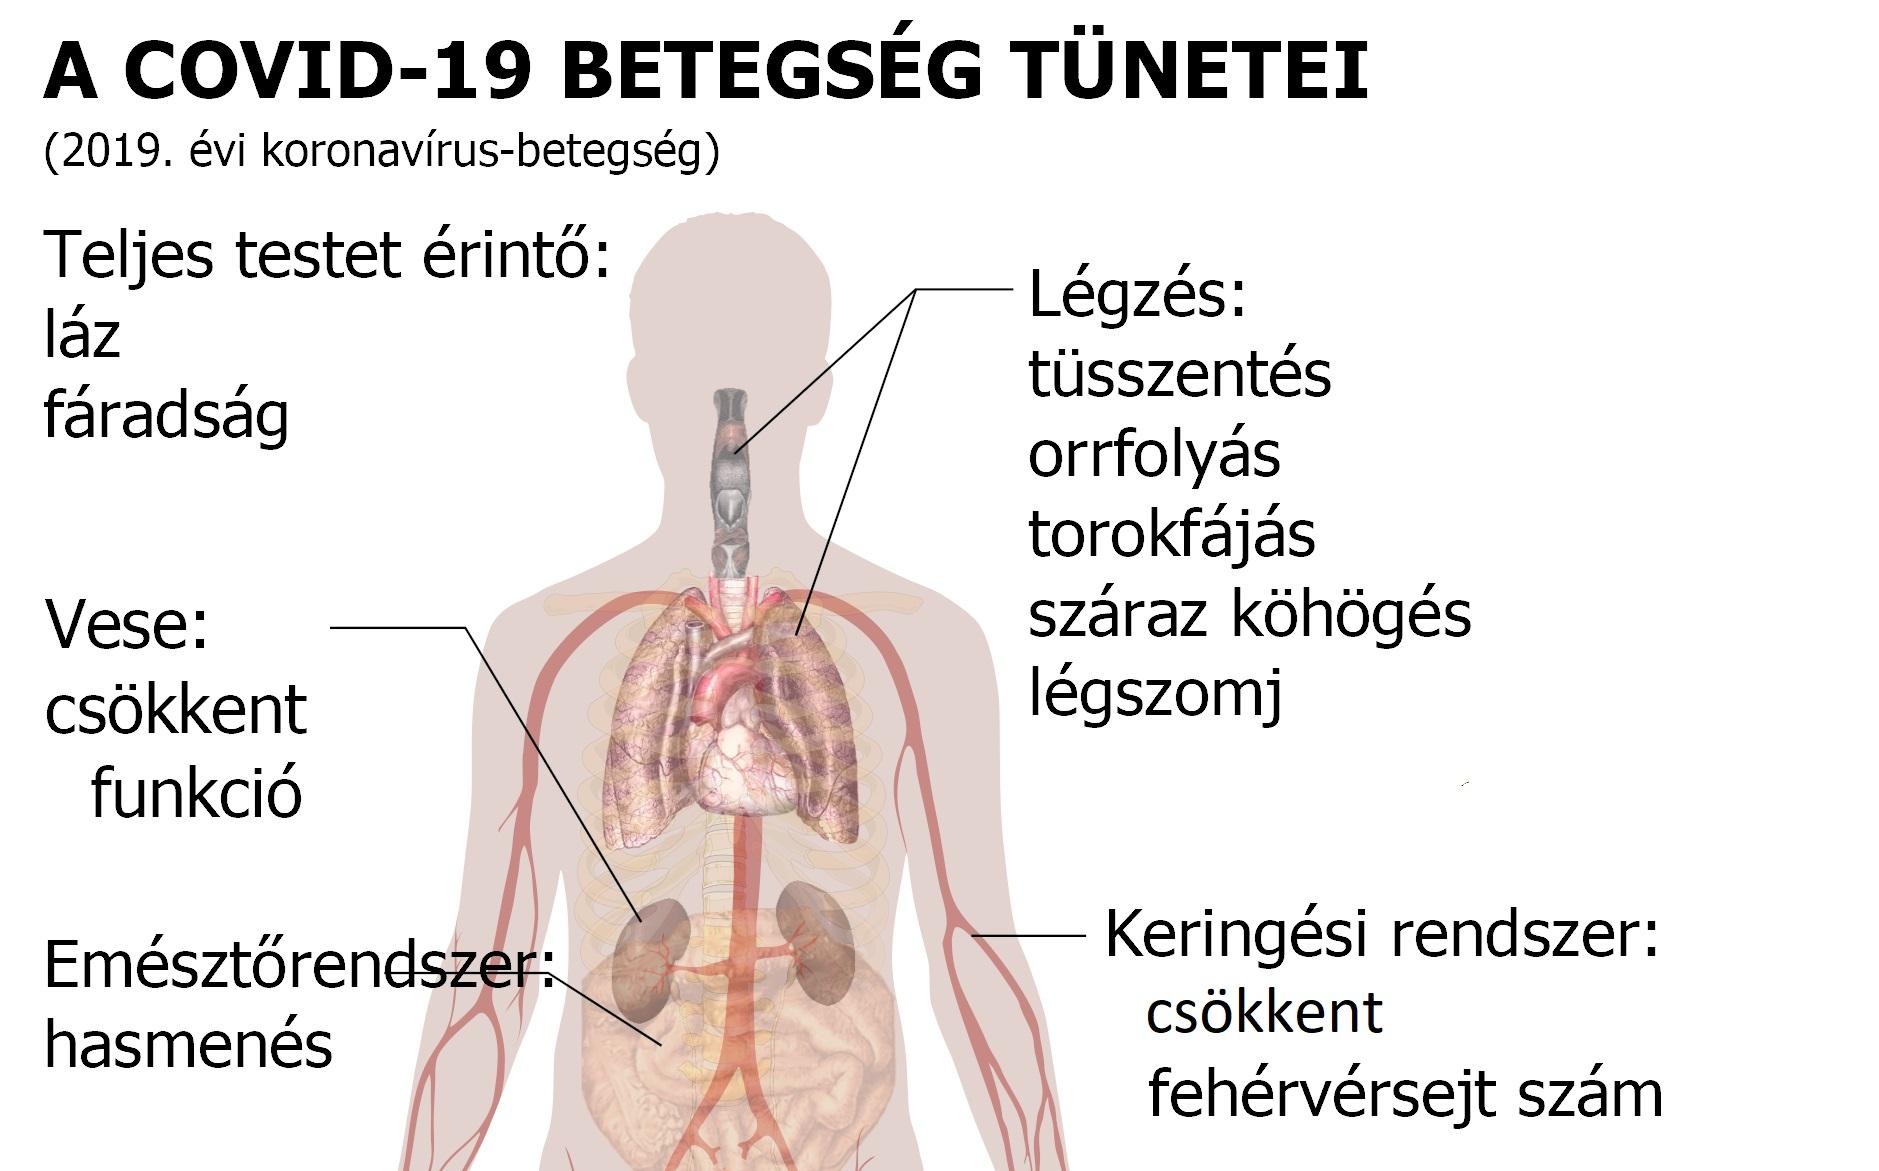 enterobiosis csecsemők tünetei)